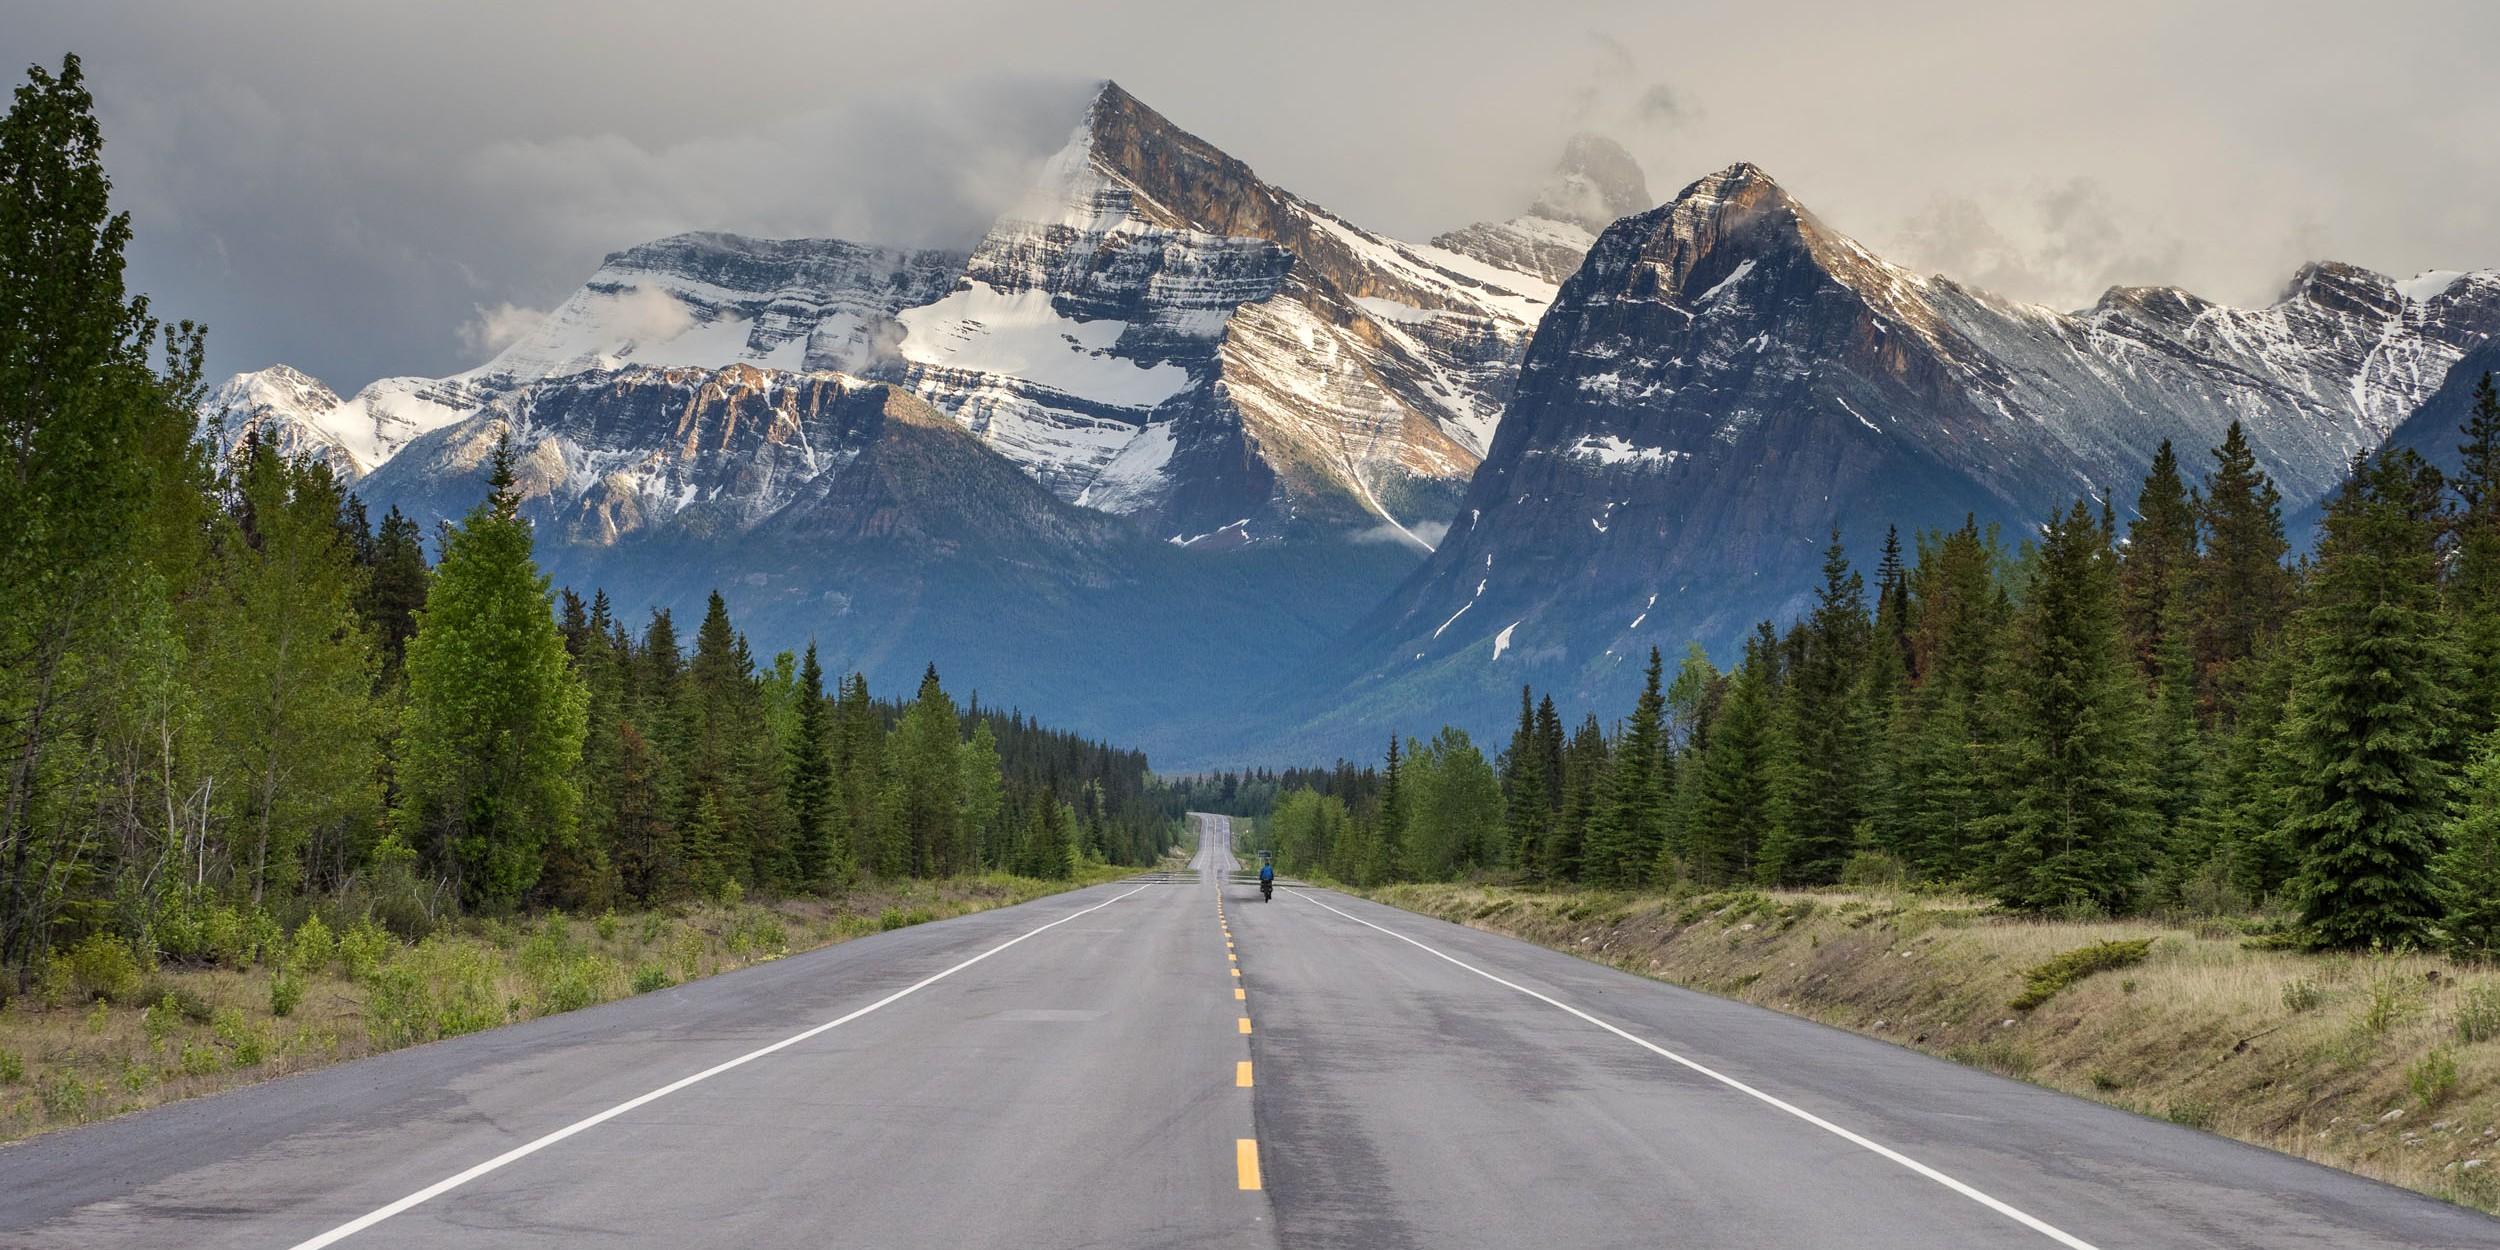 Rocky Mountains Multimediavortrag